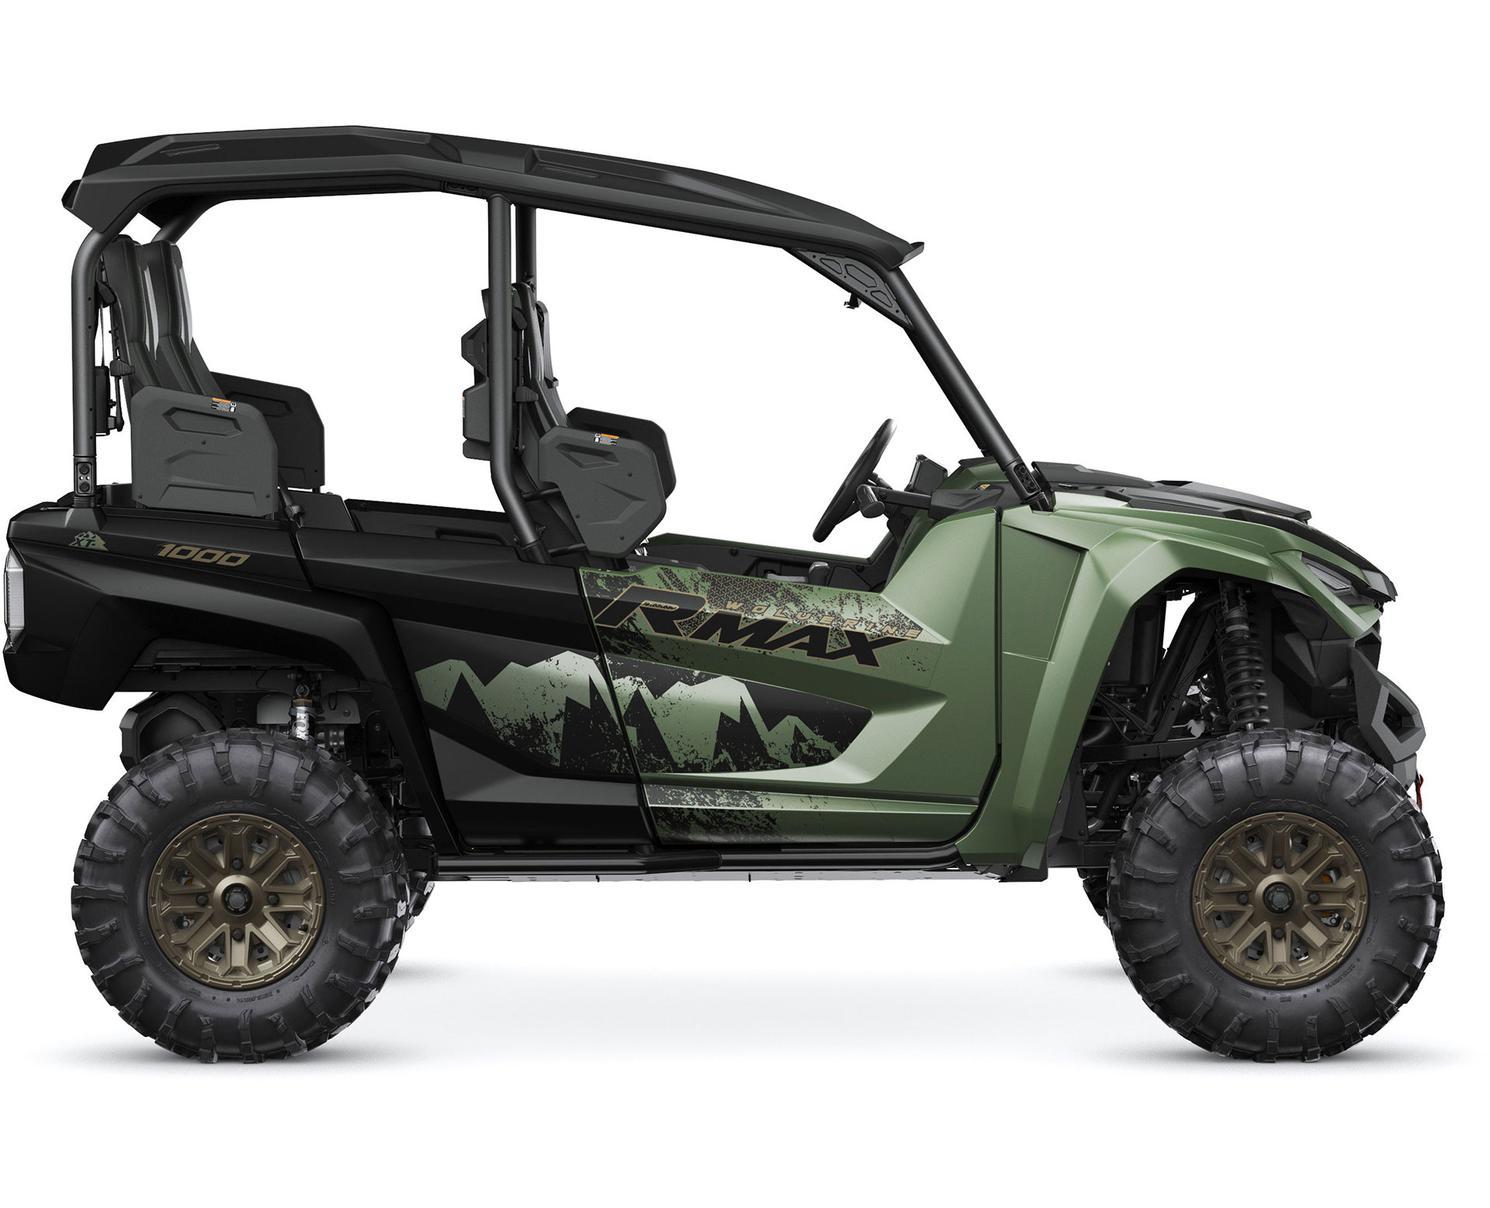 2021 Yamaha Wolverine RMAX4 1000 EPS SE Covert Green